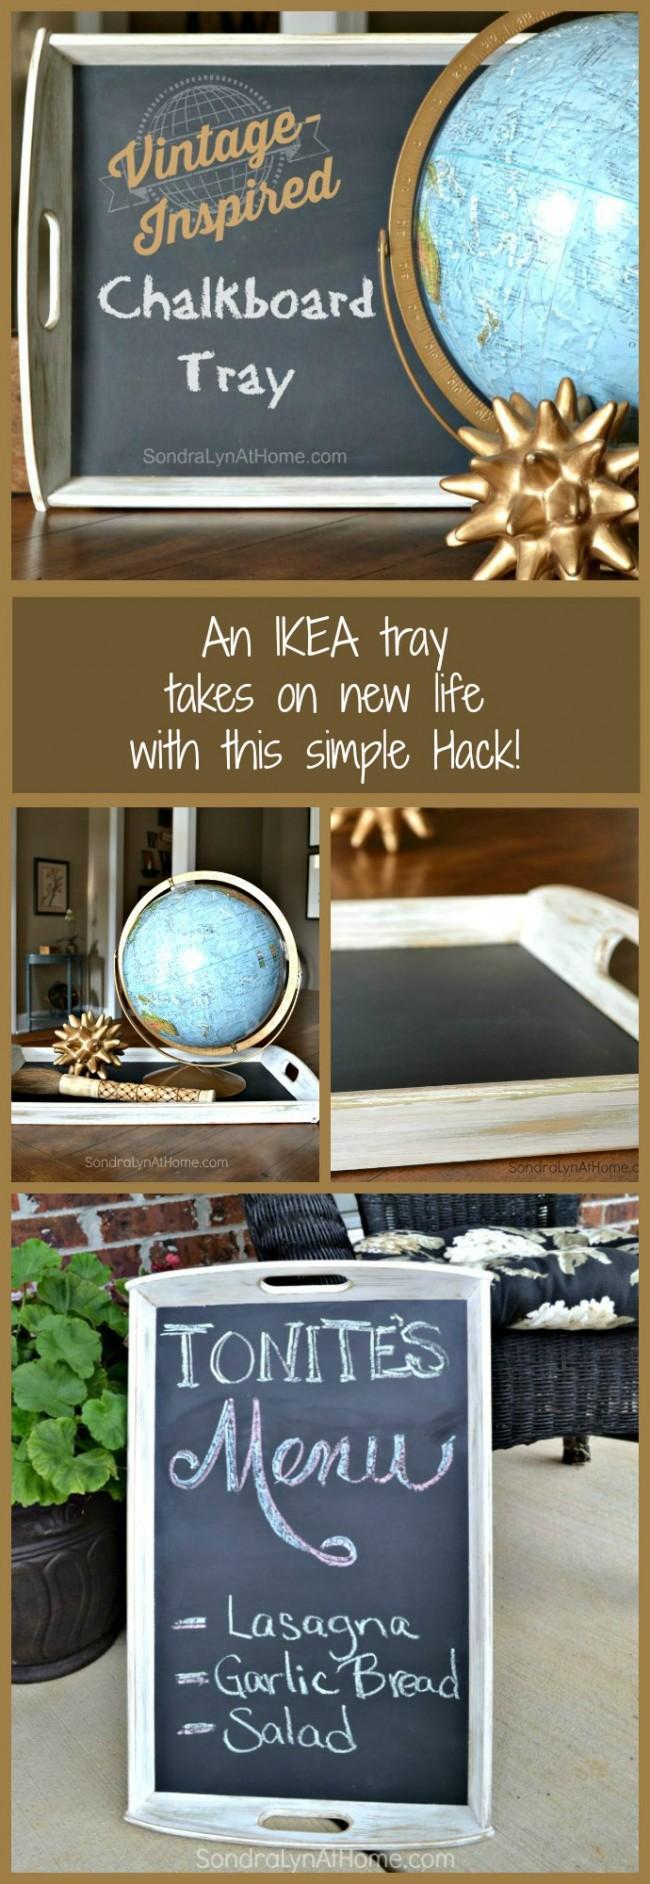 IKEA Hack Chalkboard Tray - - SondraLynAtHome.com